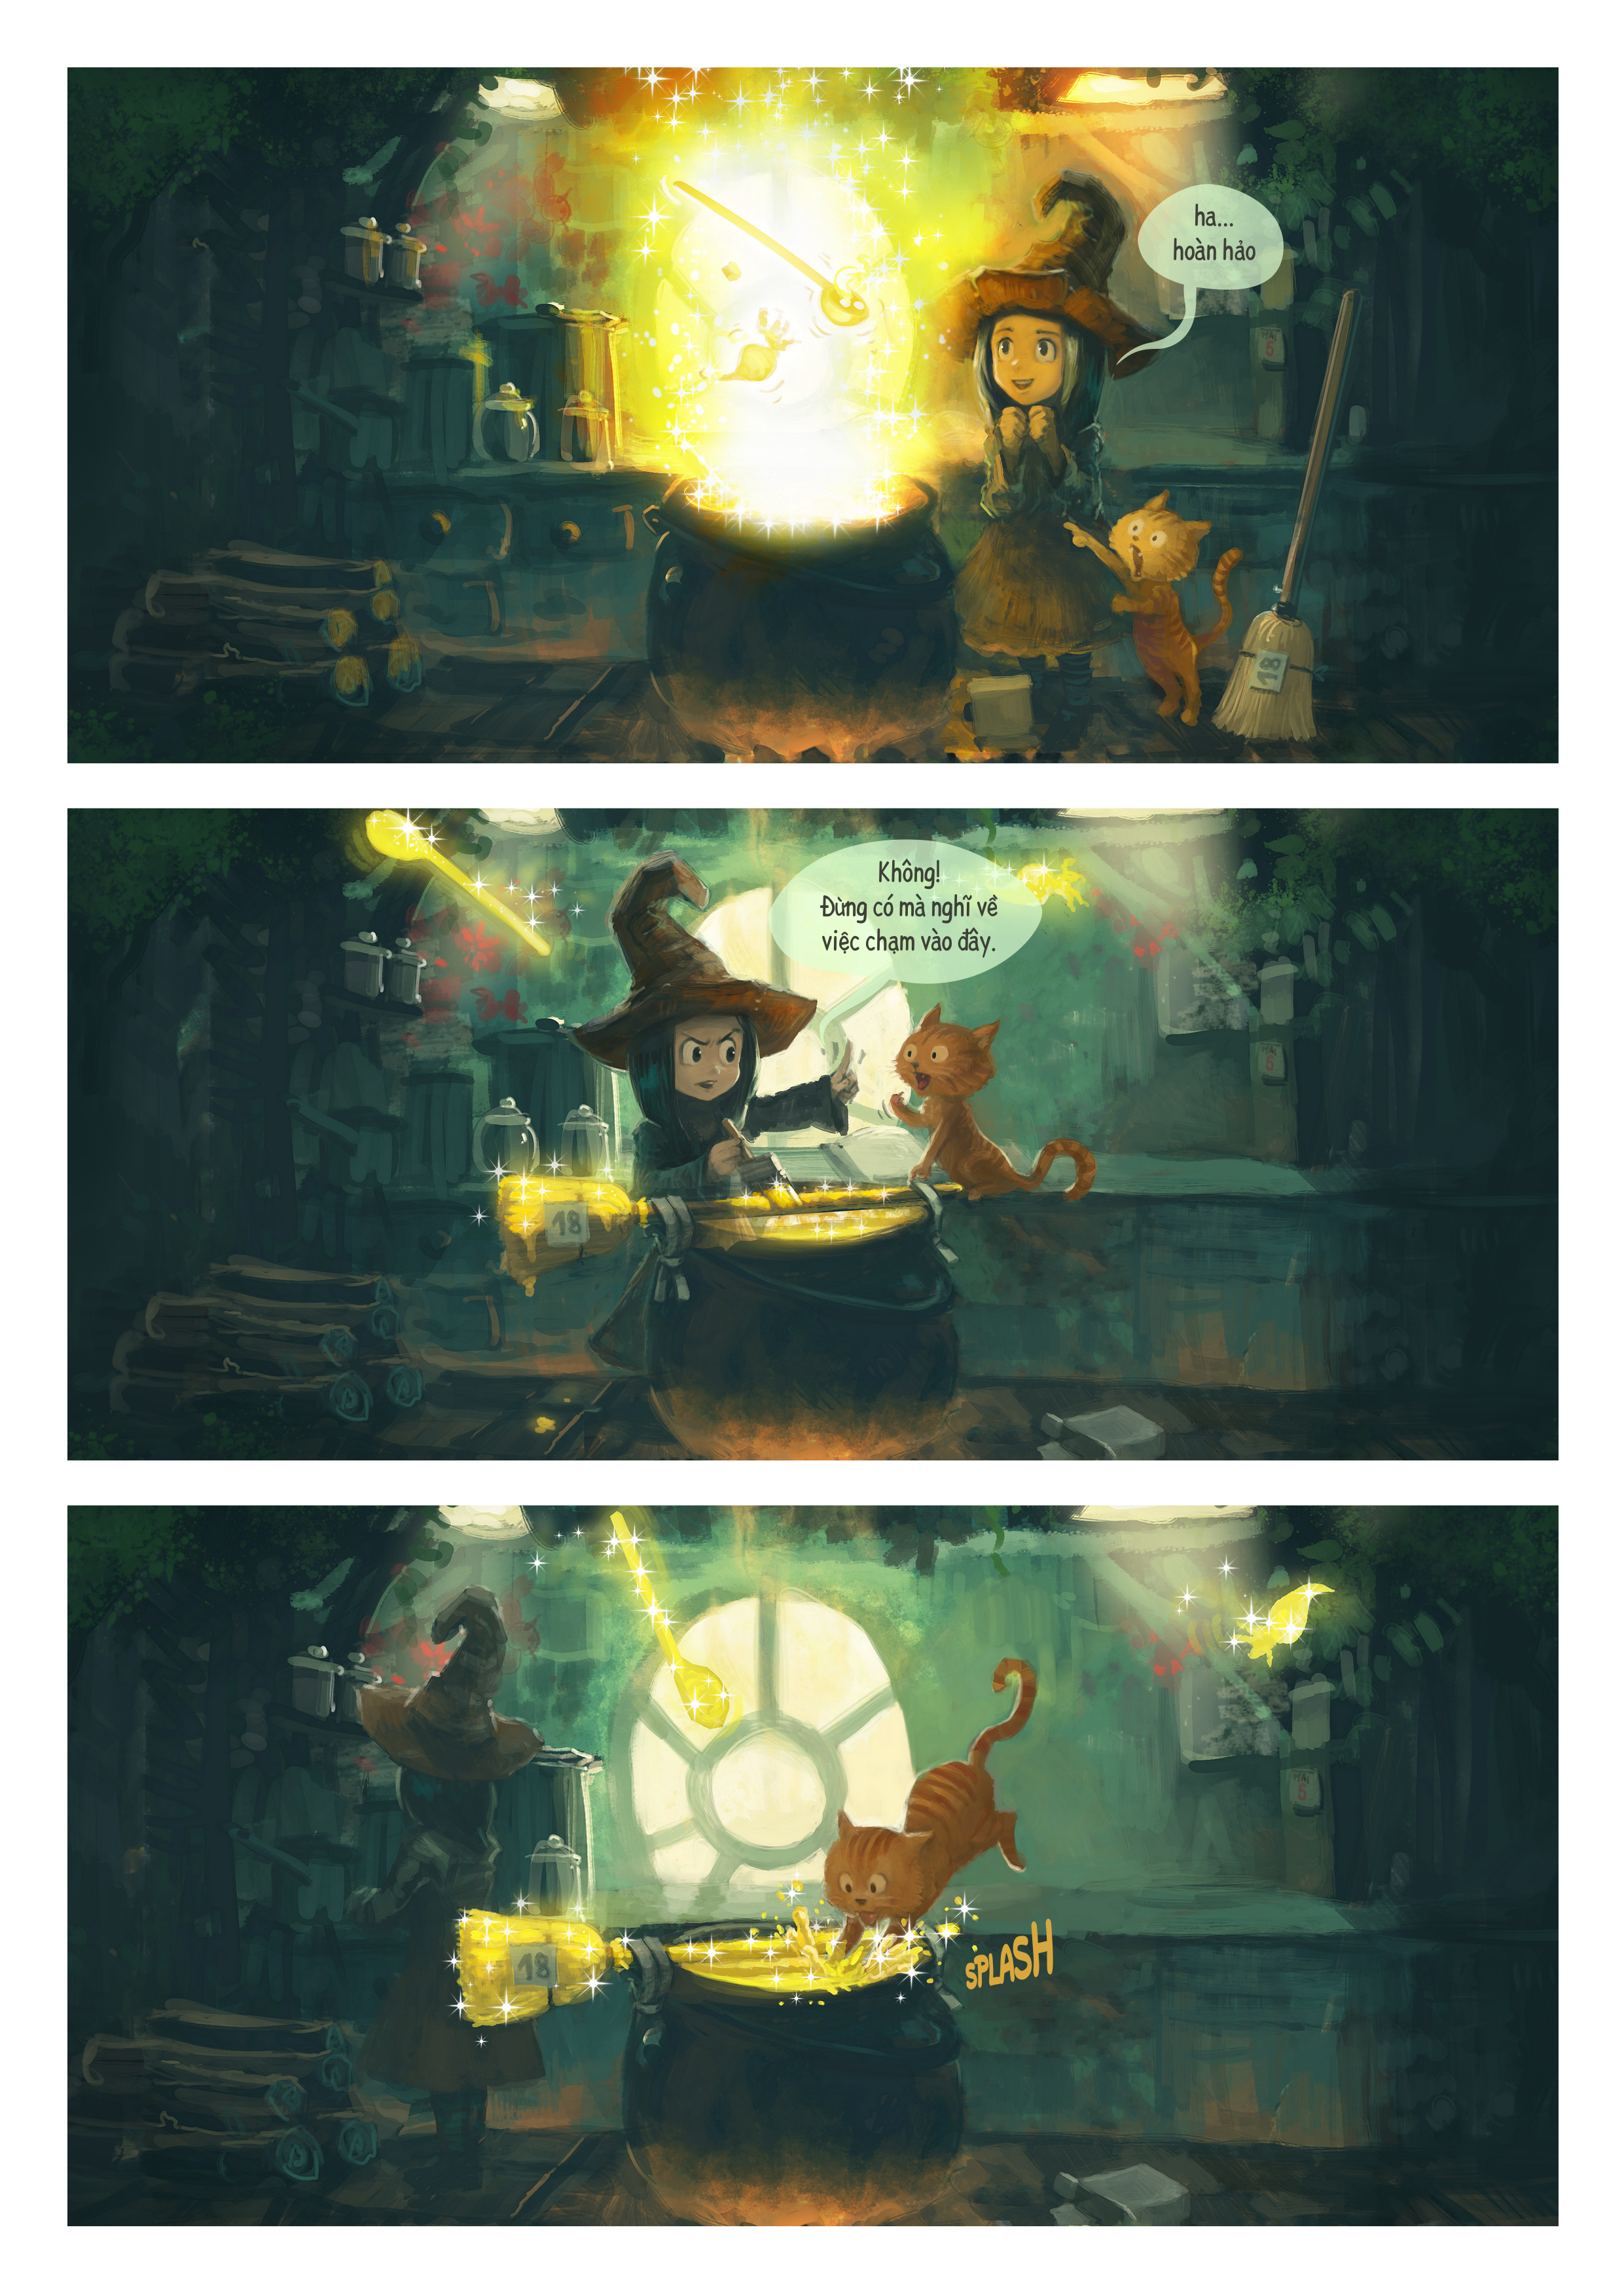 A webcomic page of Pepper&Carrot, Tập 1 [vi], trang 2